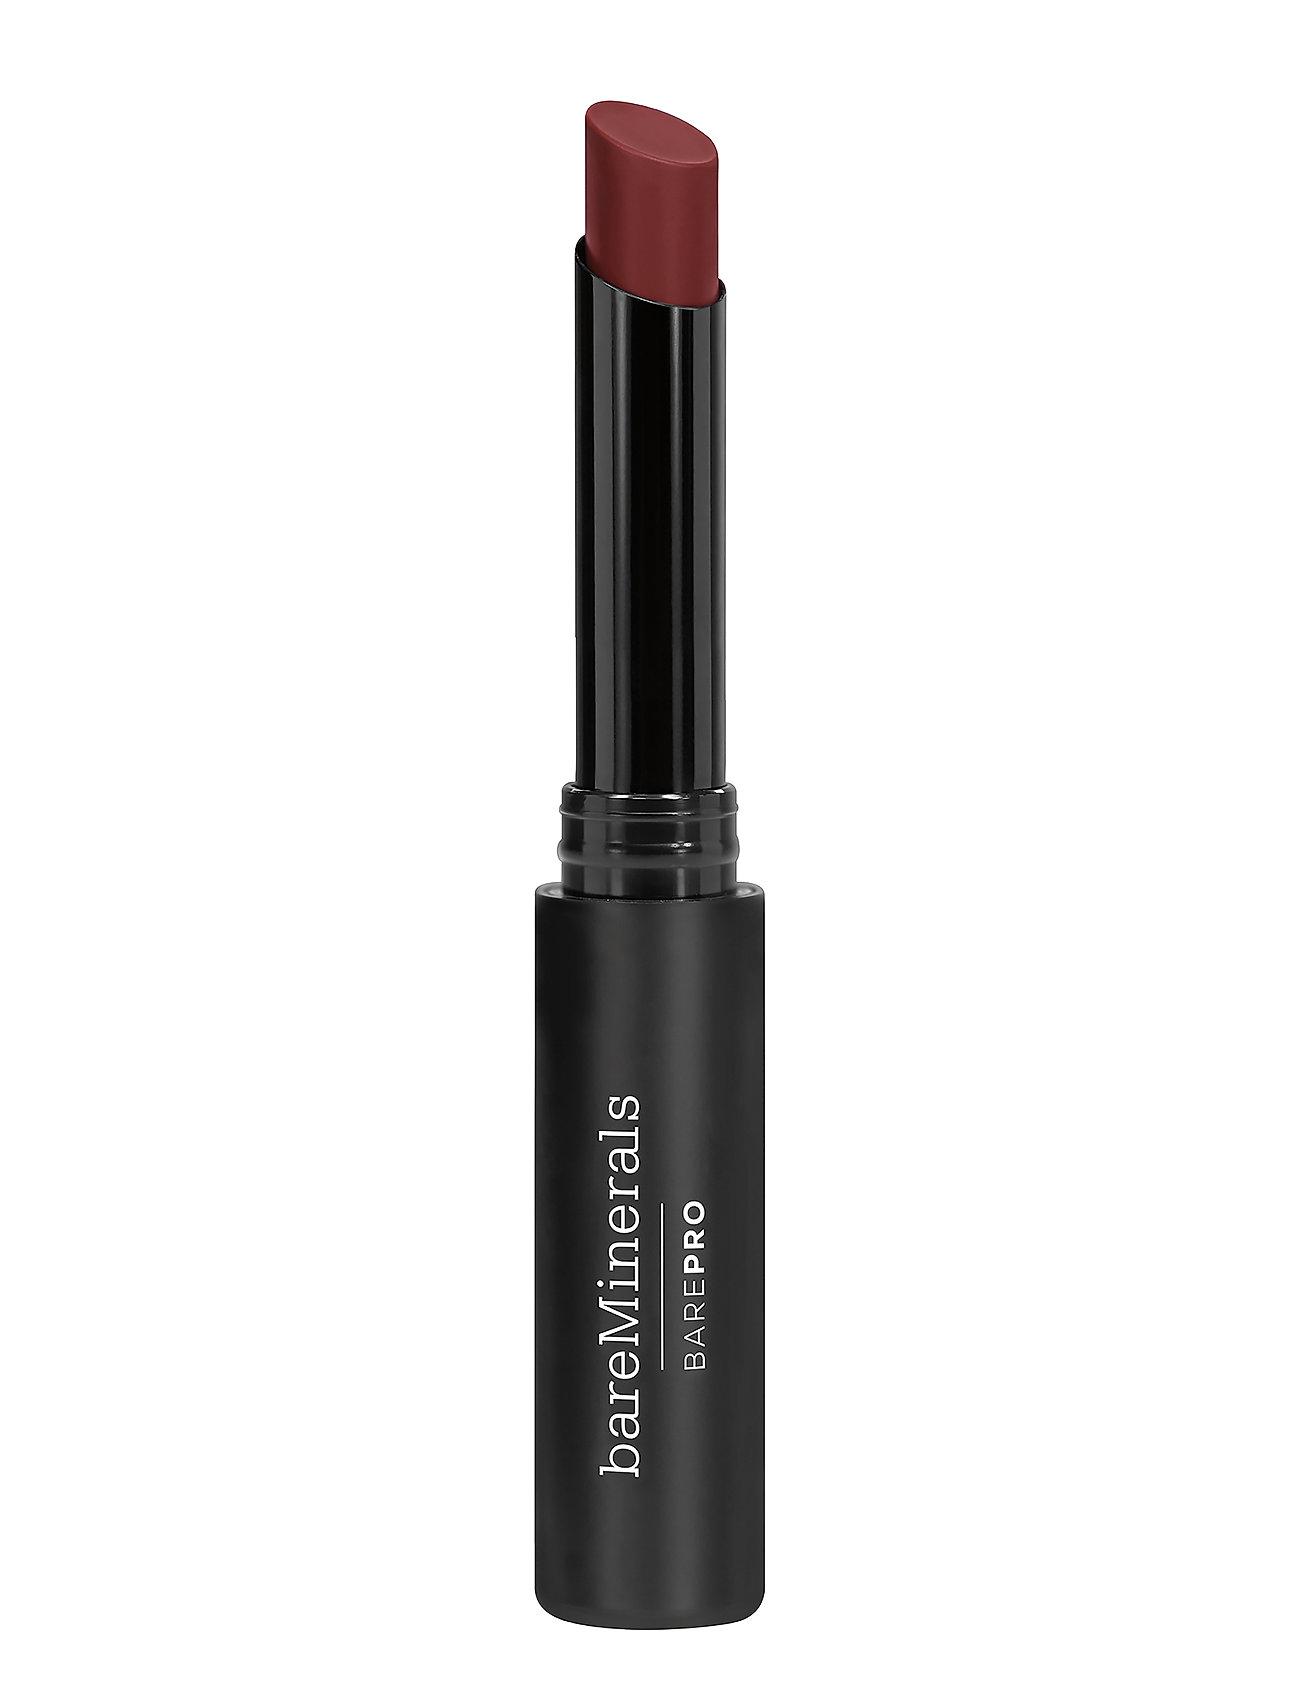 Image of Barepro Longwear Lipstick Cranberry Læbestift Makeup Rød BareMinerals (3138616977)